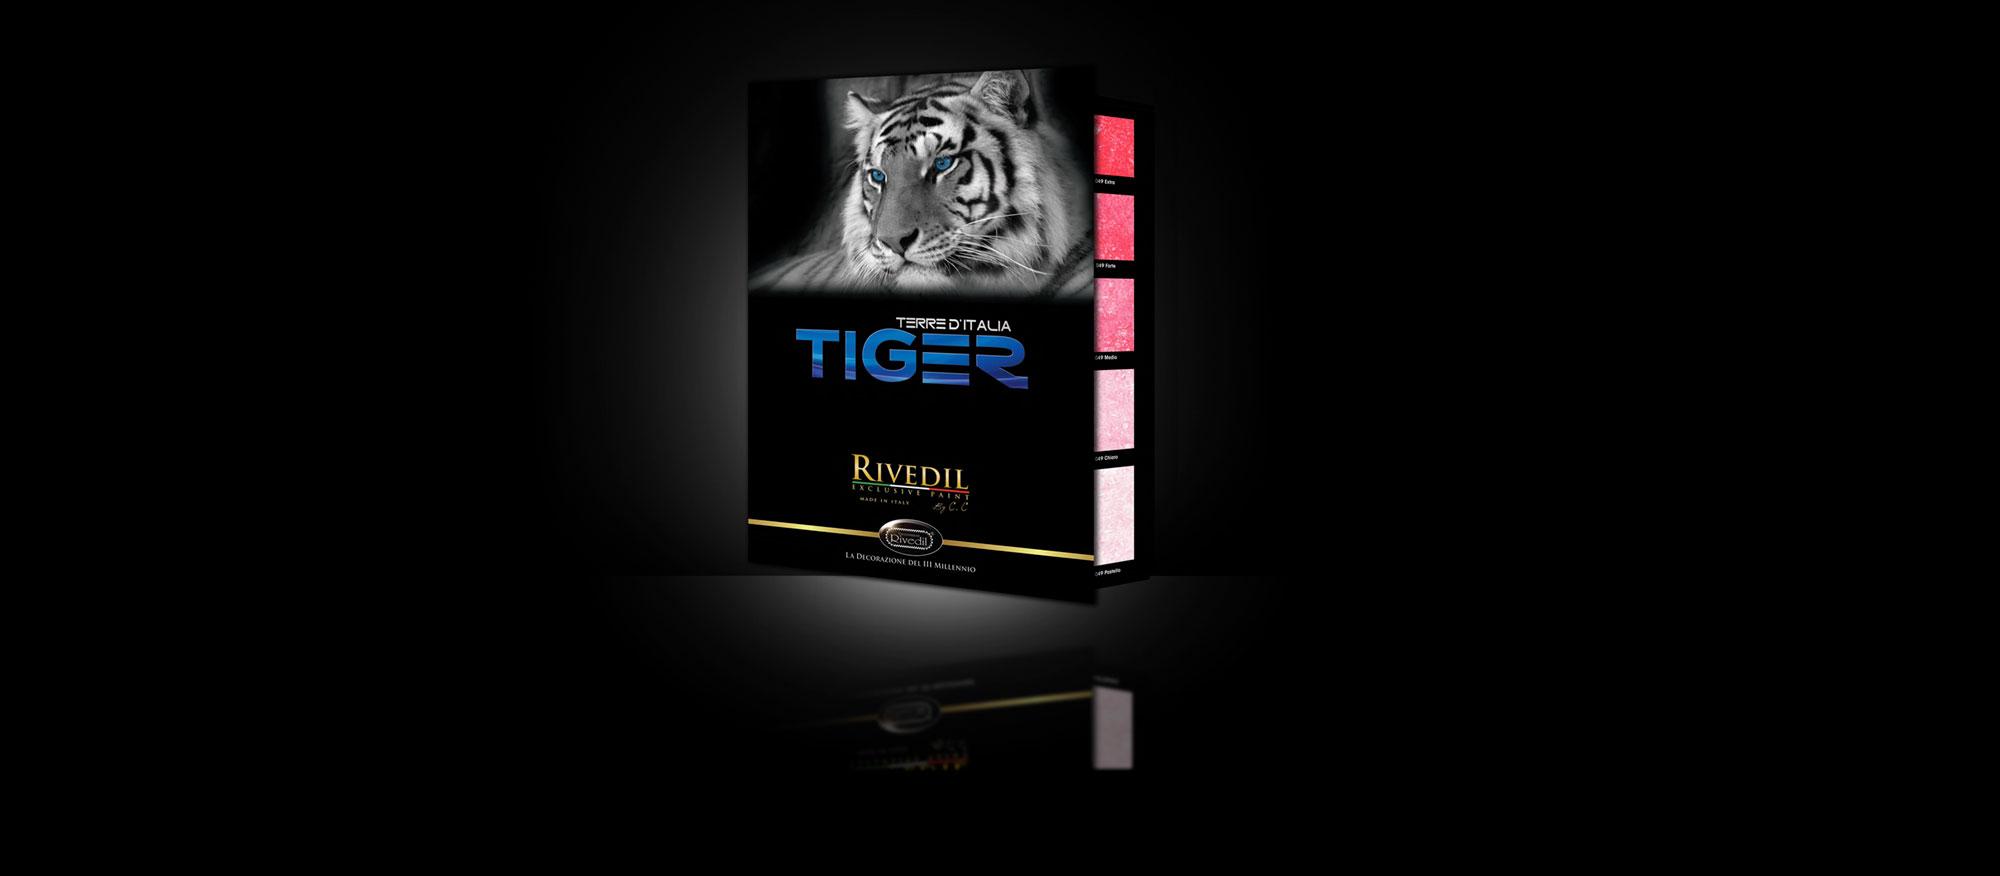 Cartella Terre D'Italia Tiger